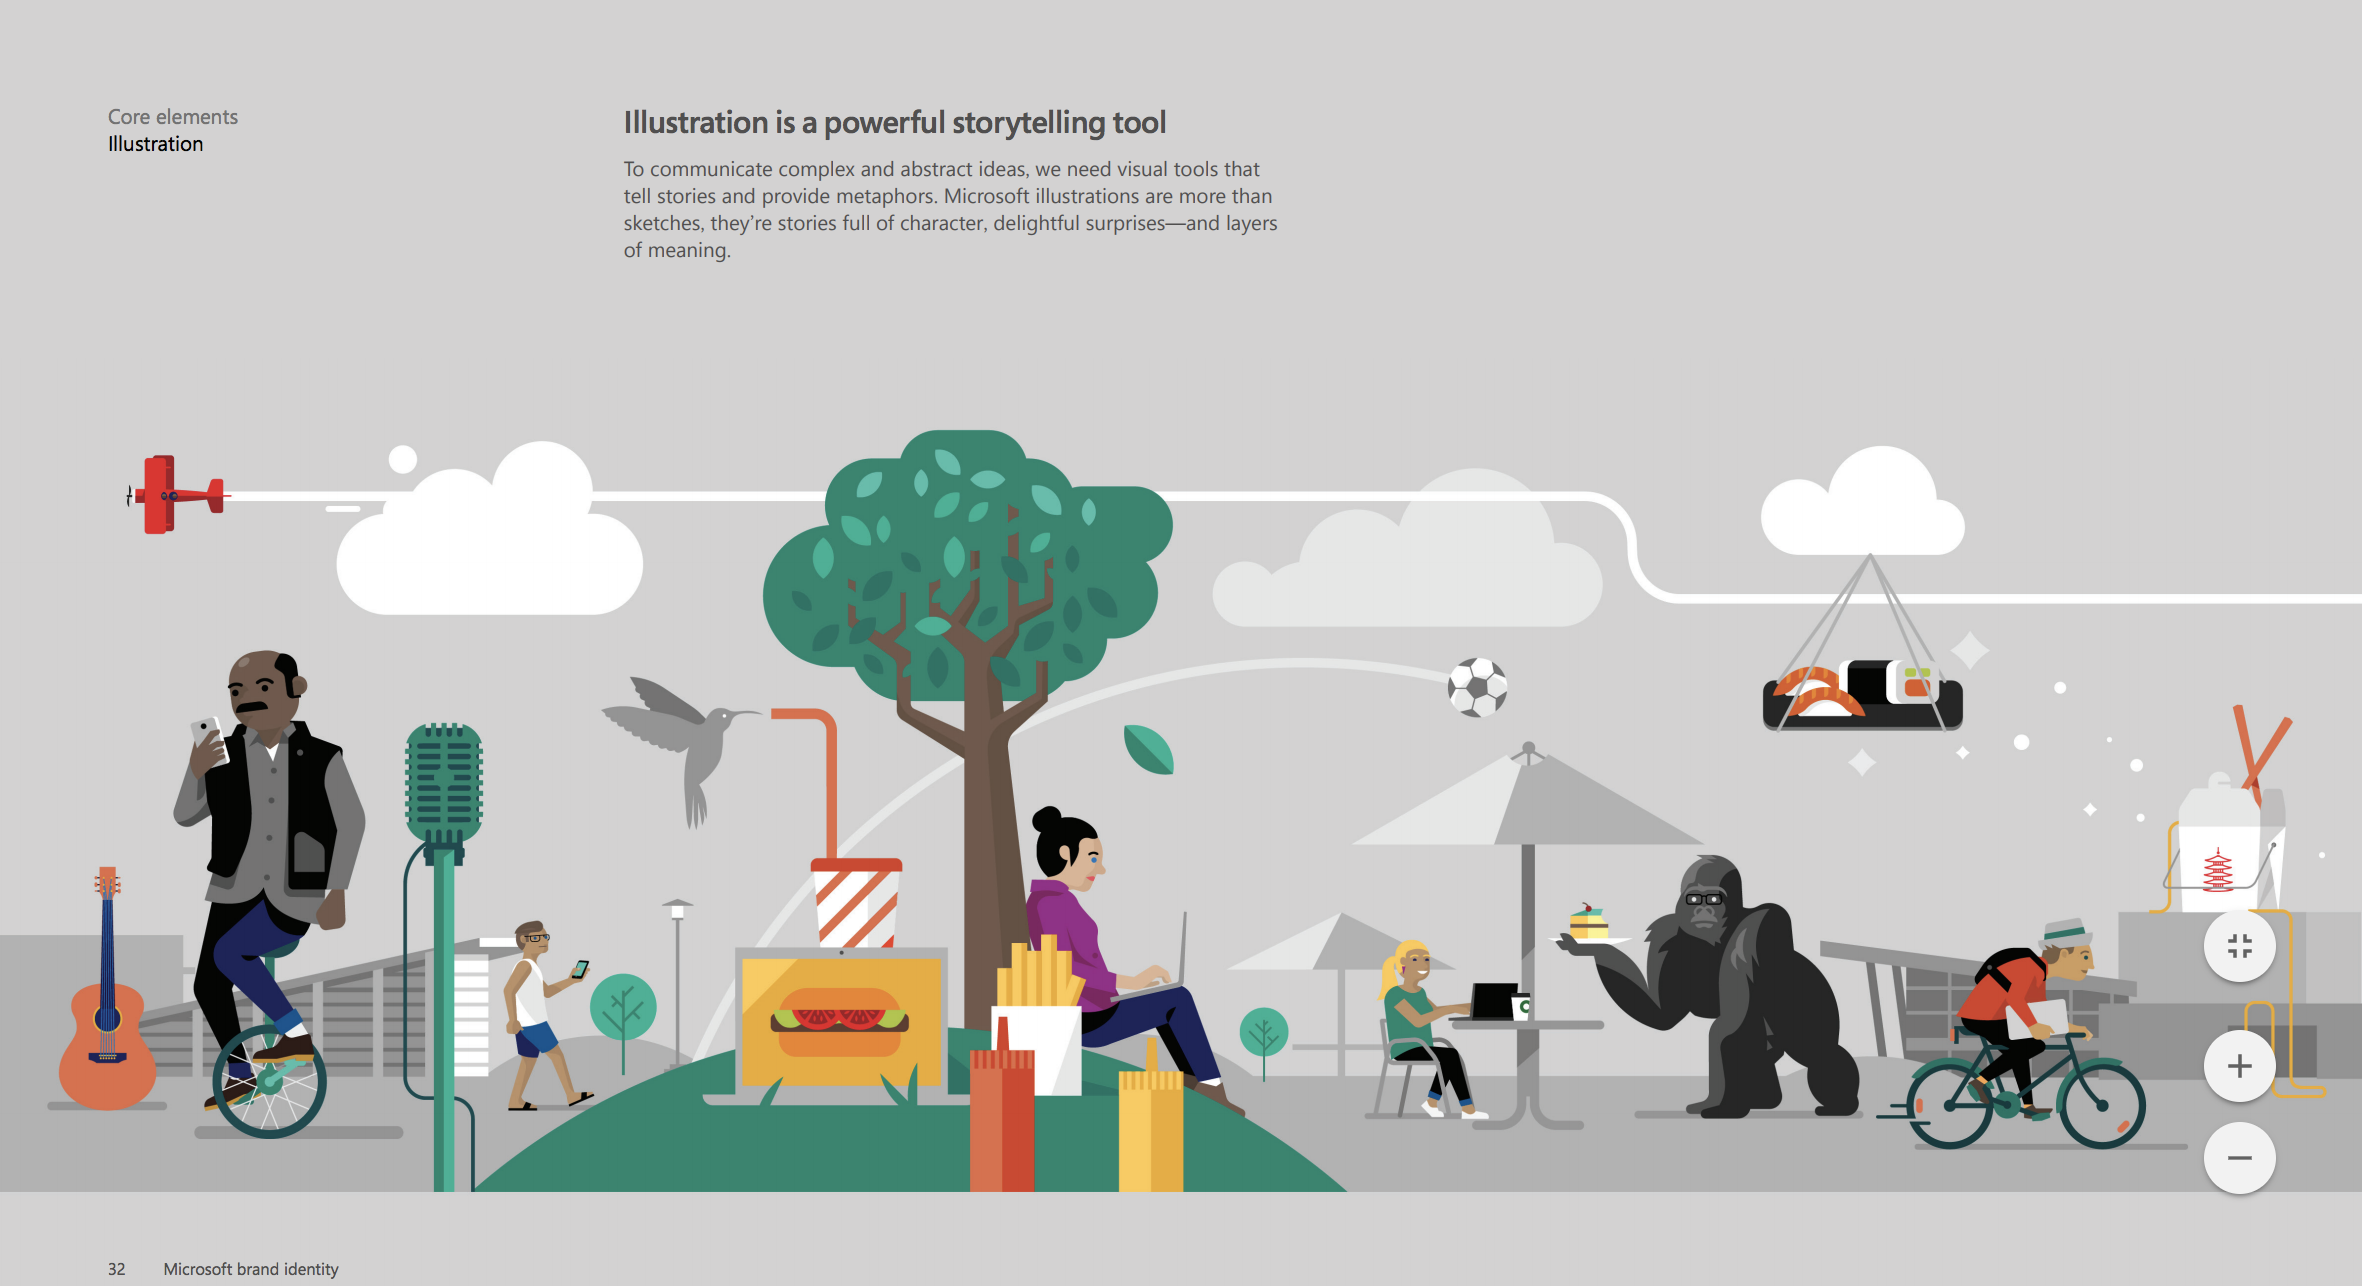 Microsoft_illustration_BrandCentral_DannySchlitz_04.png